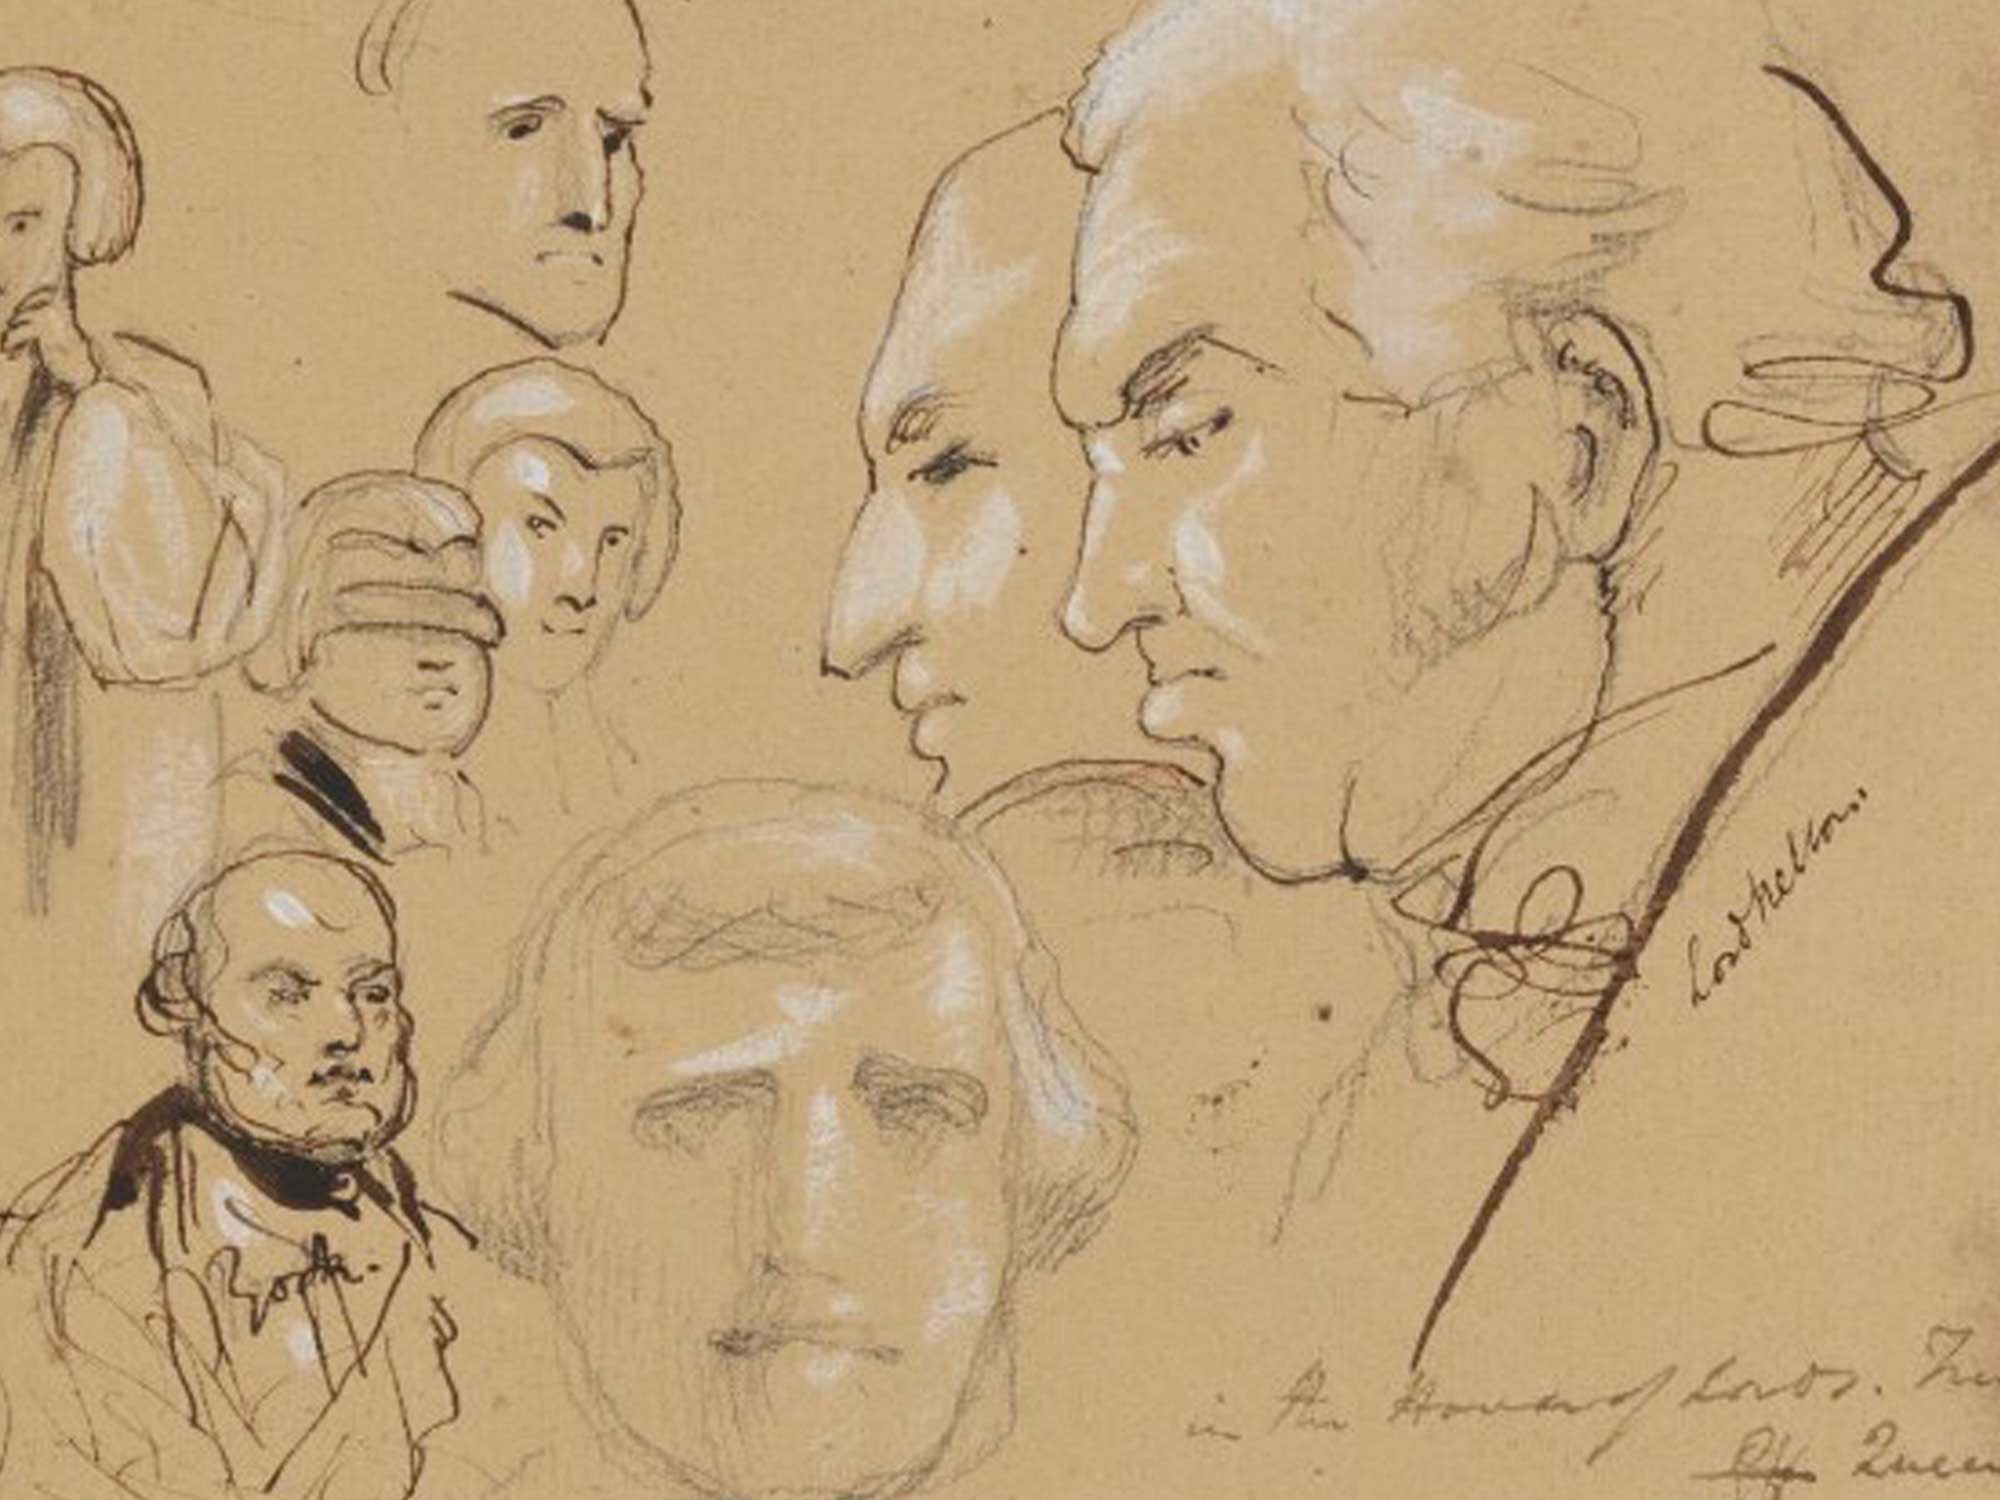 A rare pencil sketch of William Nelson